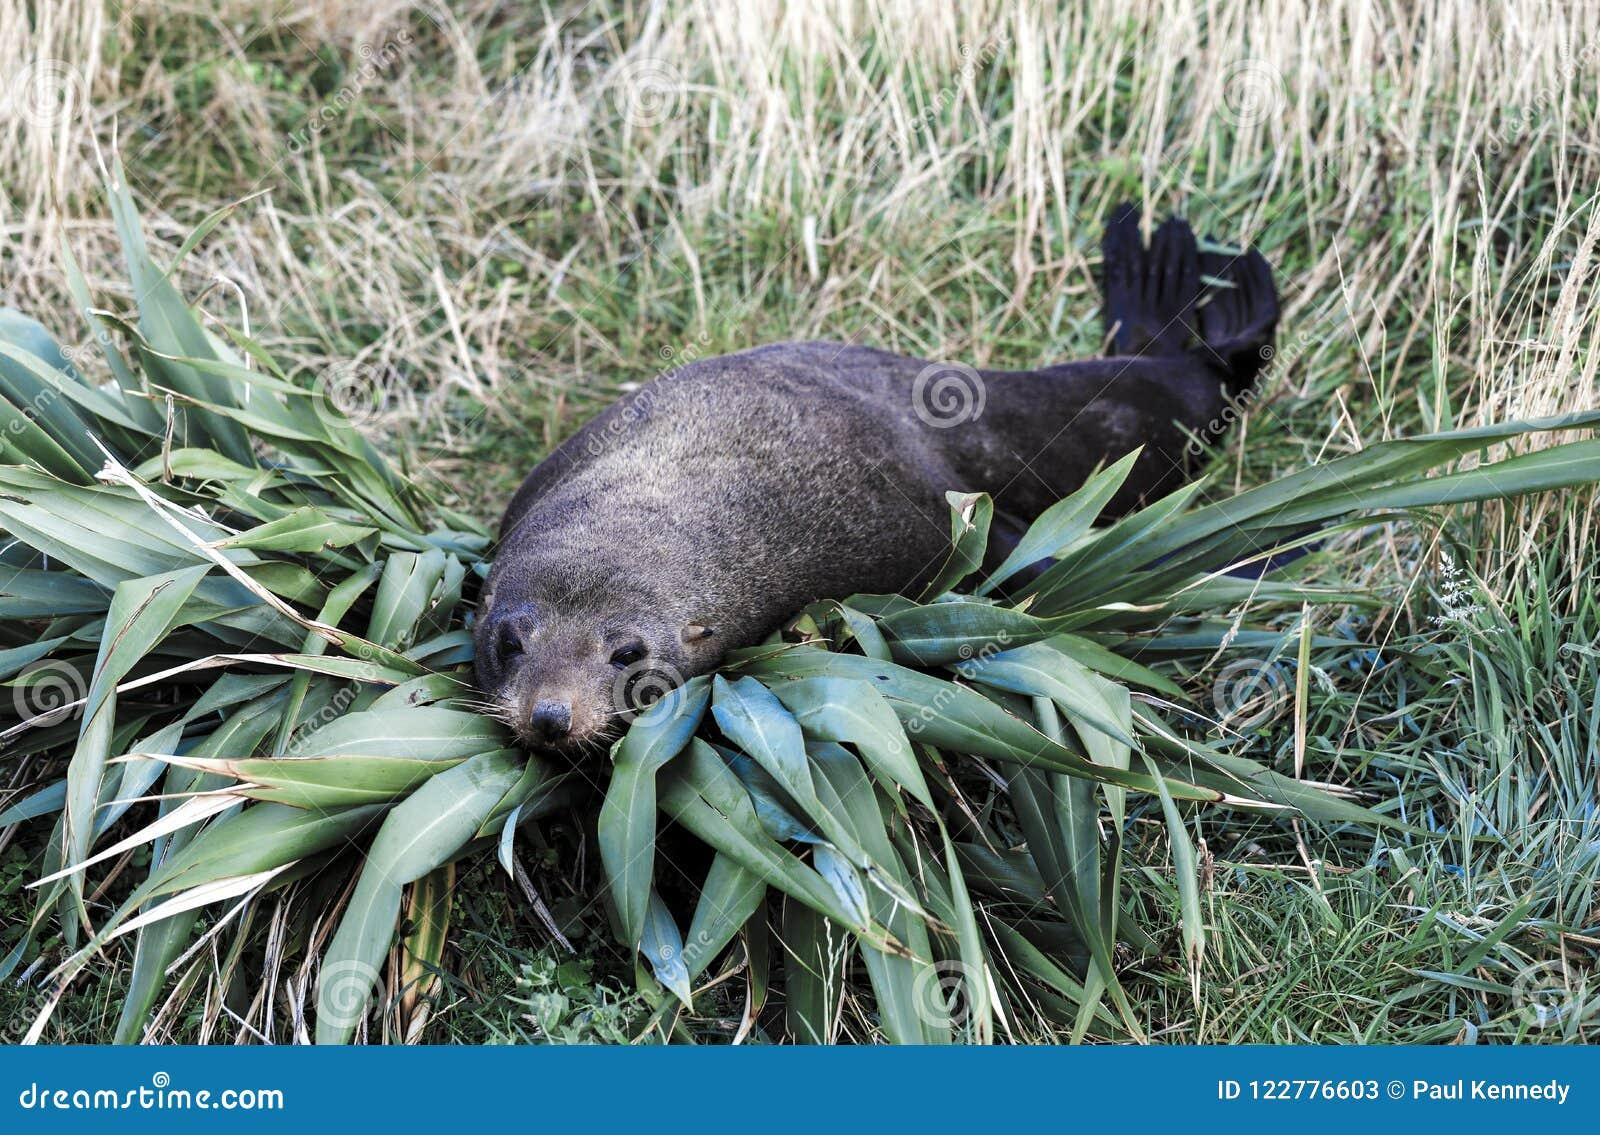 Forsteri котика морского котика Новой Зеландии отдыхая на кусте льна